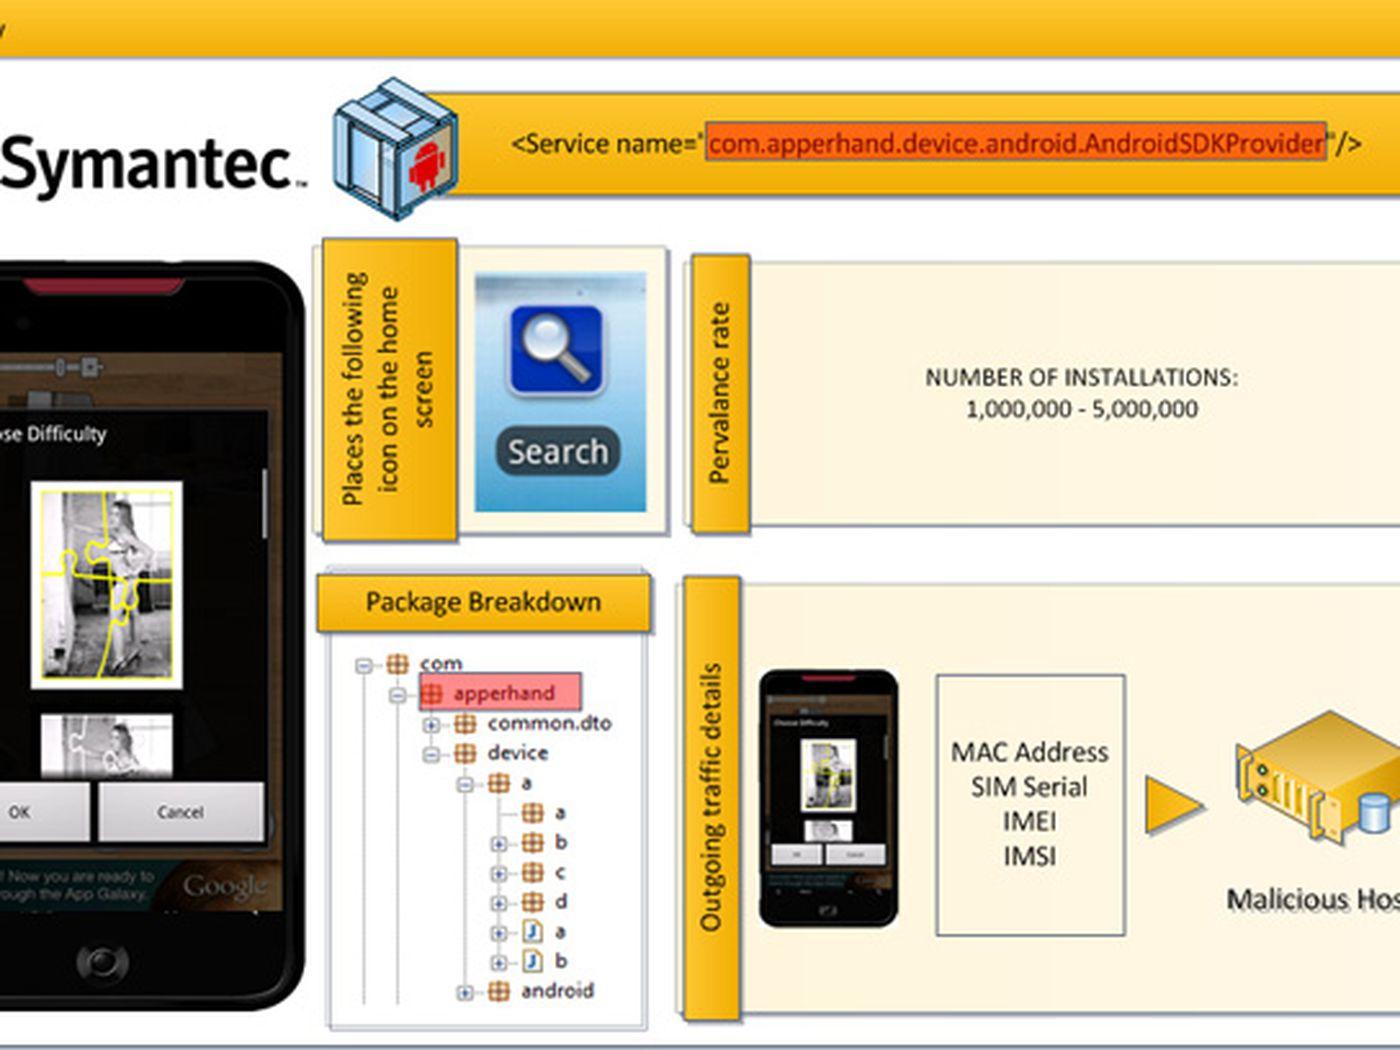 Symantec clarifies Counterclank malware claim on Android, no